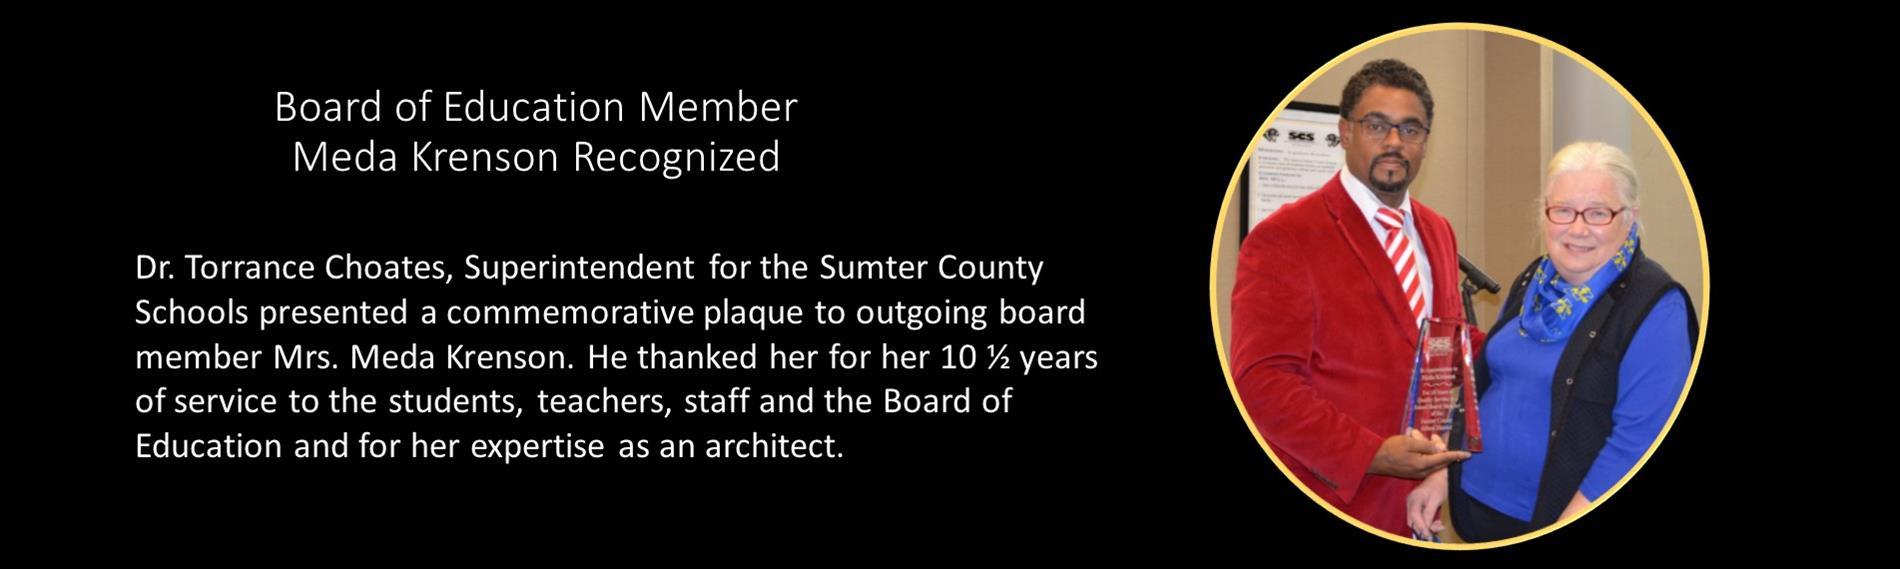 Board of Education Member Meda Krenson Recognized